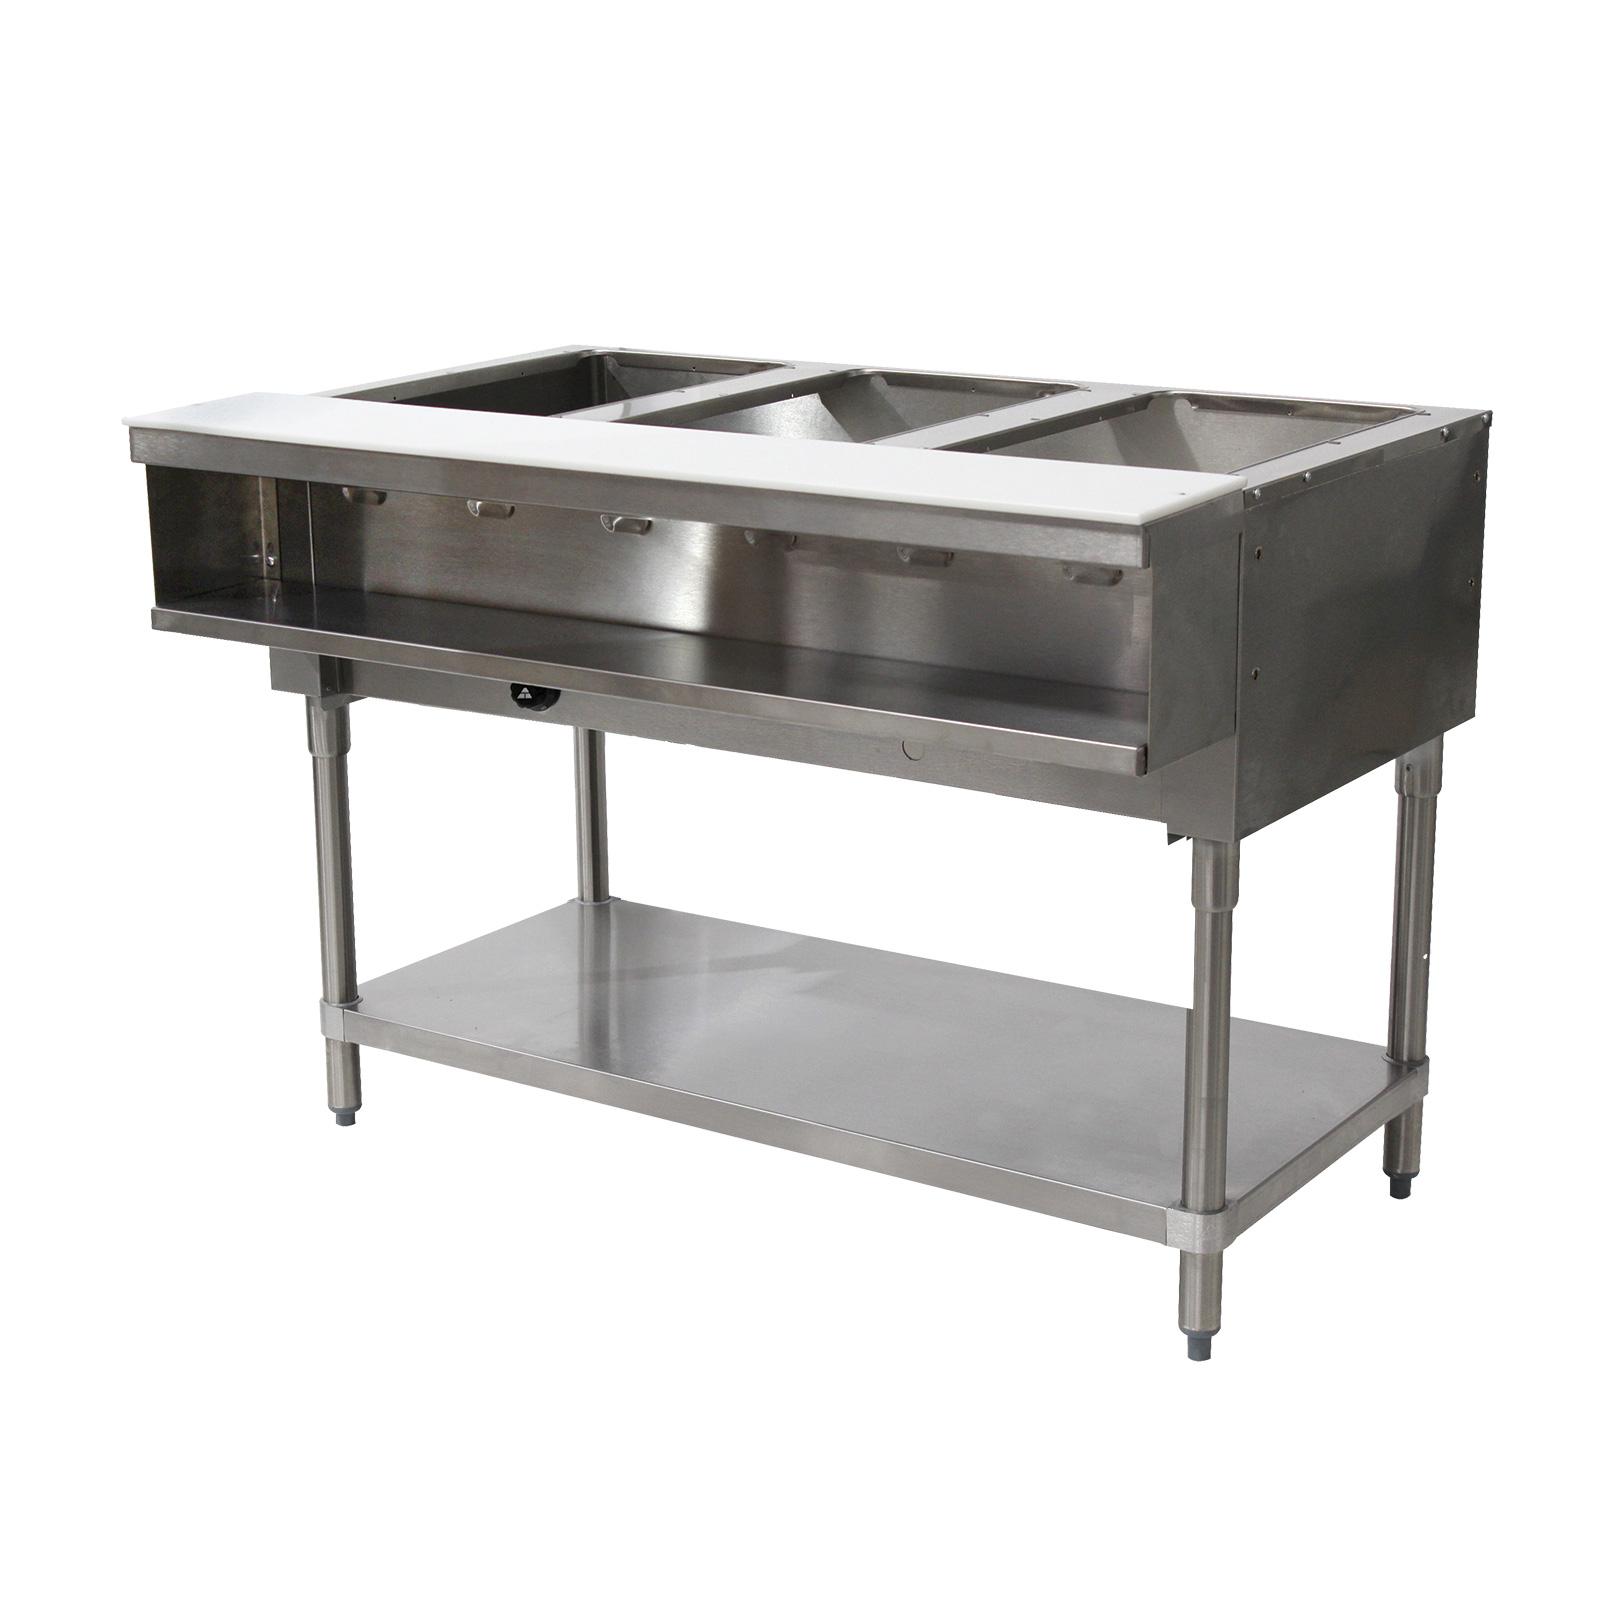 Advance Tabco WB-3G-NAT-X serving counter, hot food, gas